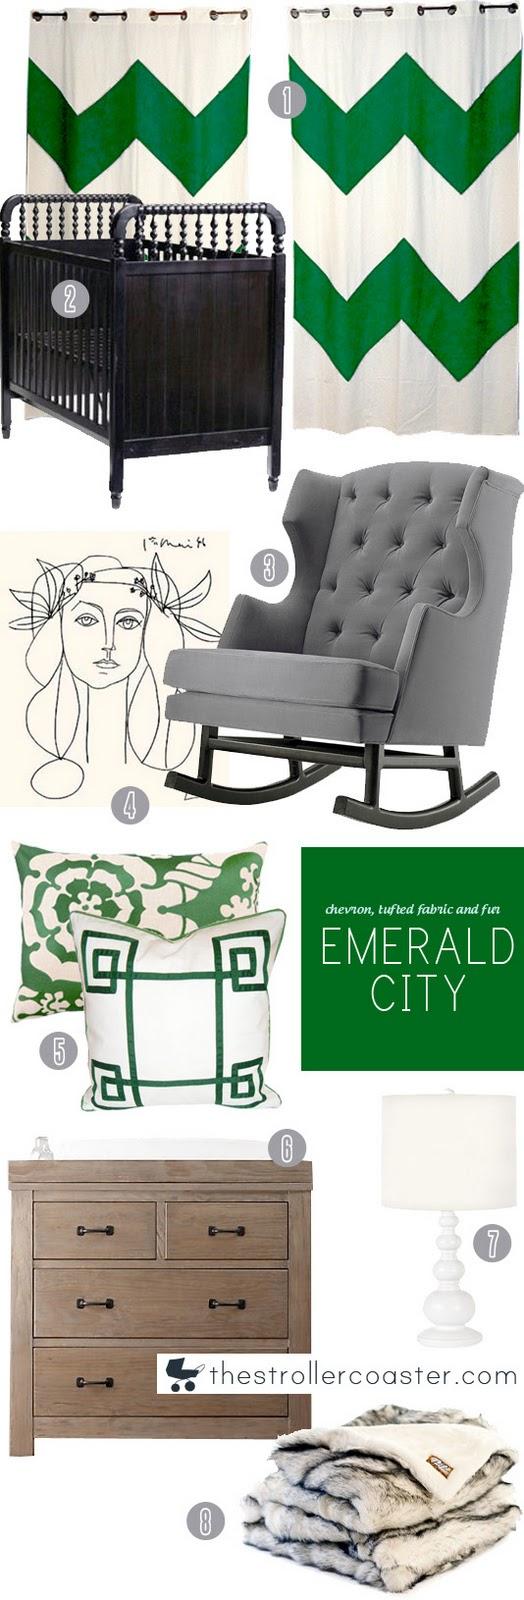 emerald city #coloroftheyear